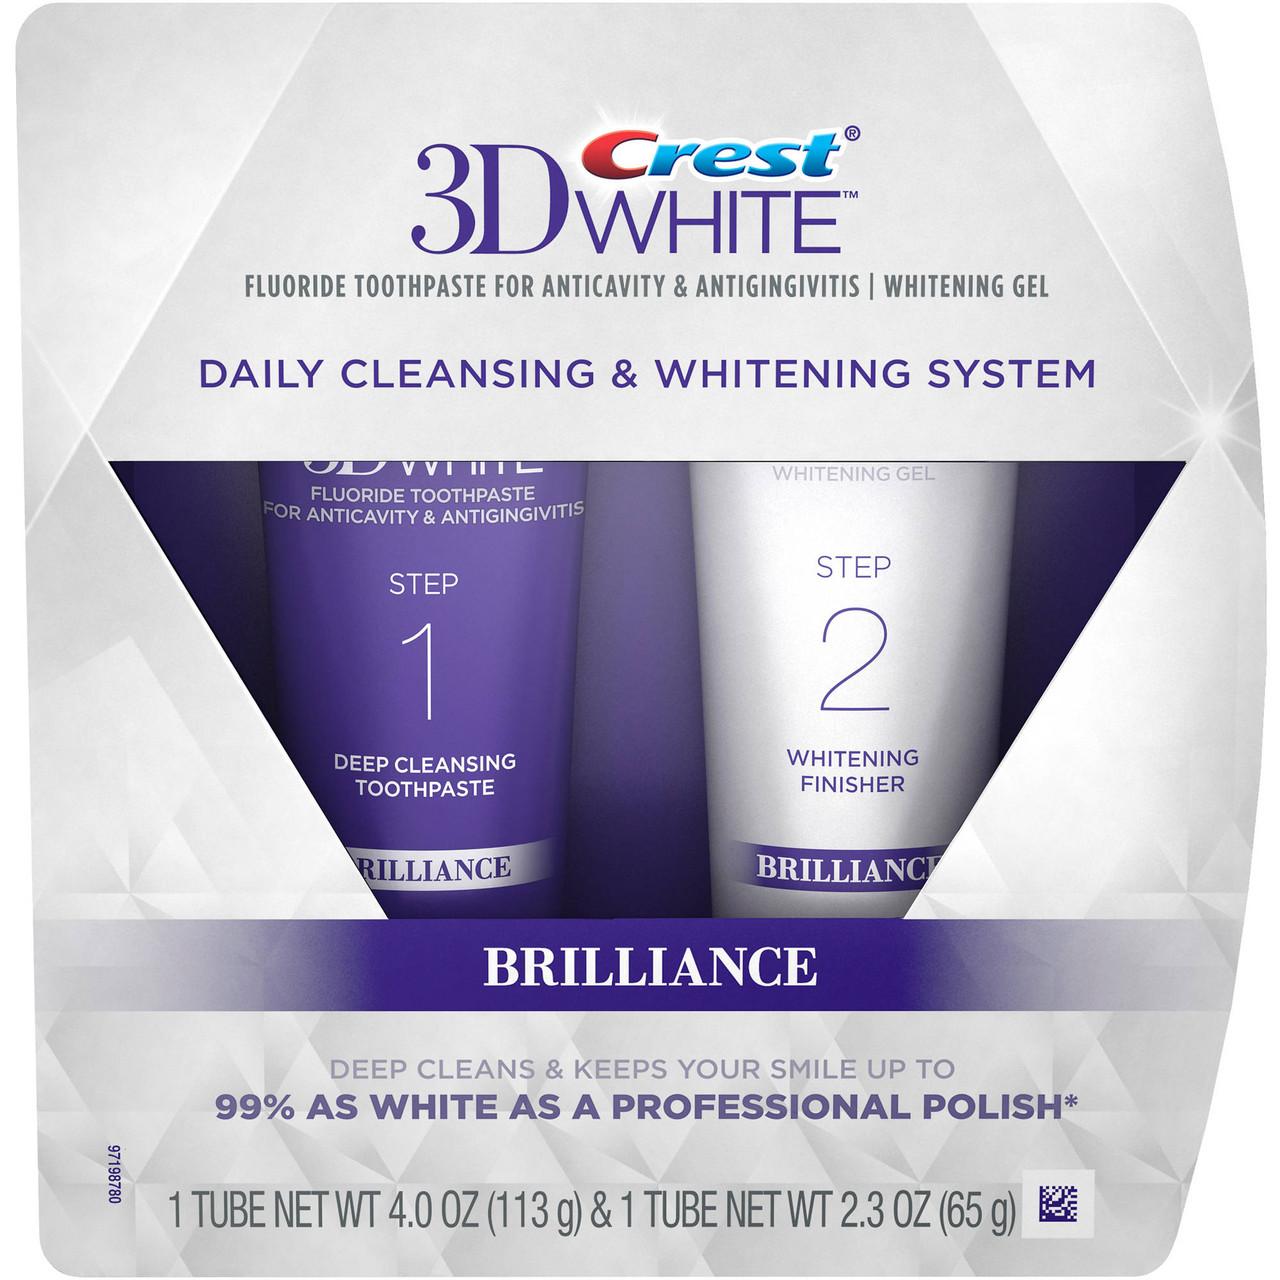 Двухуровневая система отбеливания зубов Crest 3D White Brilliance Daily Cleansing Toothpaste and Whitening Gel